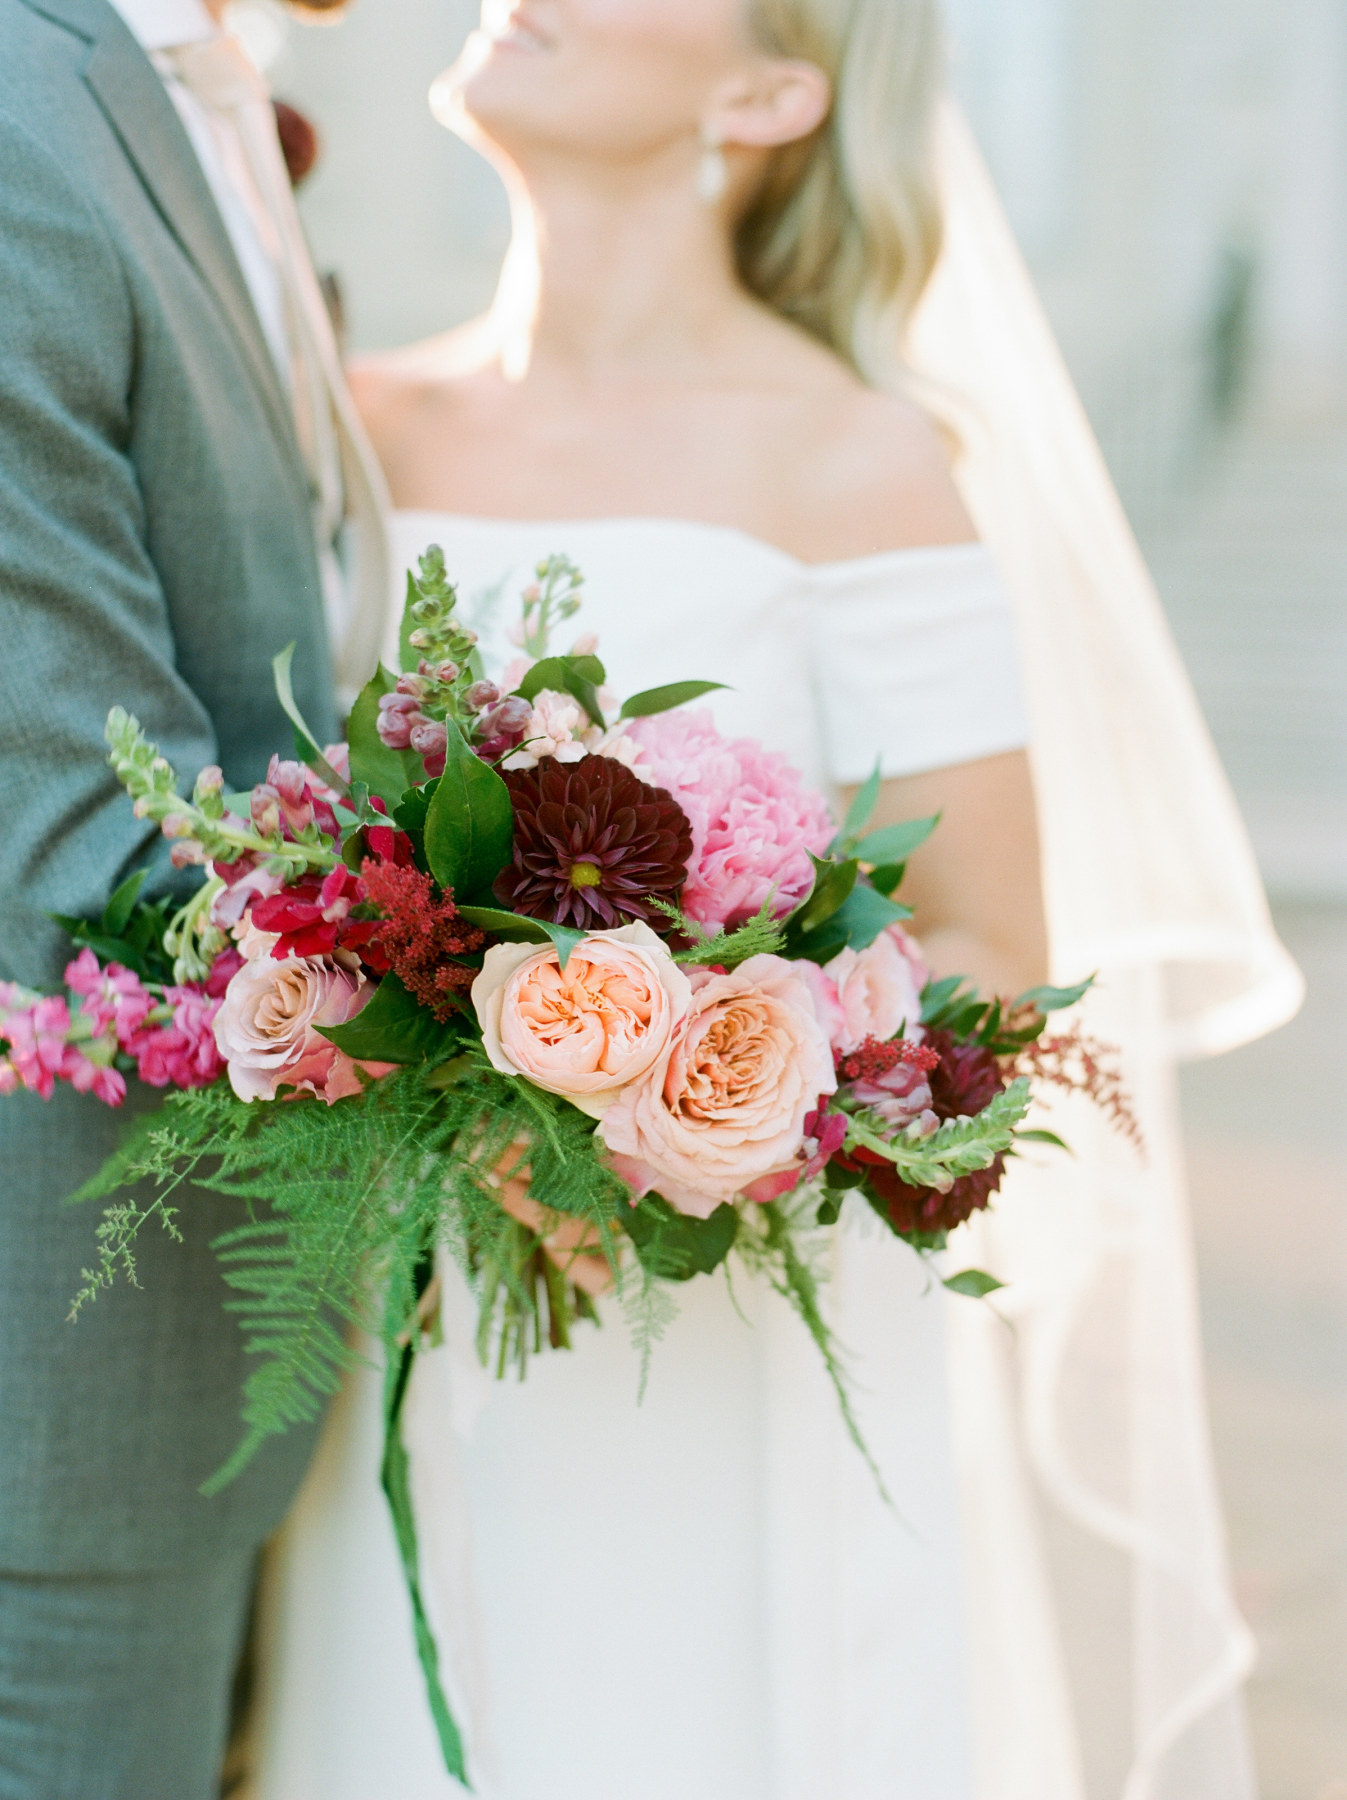 37Great_Marsh_Estates_Wedding_Anne_Kelley_Events_Astrid_Photography146486060015-2